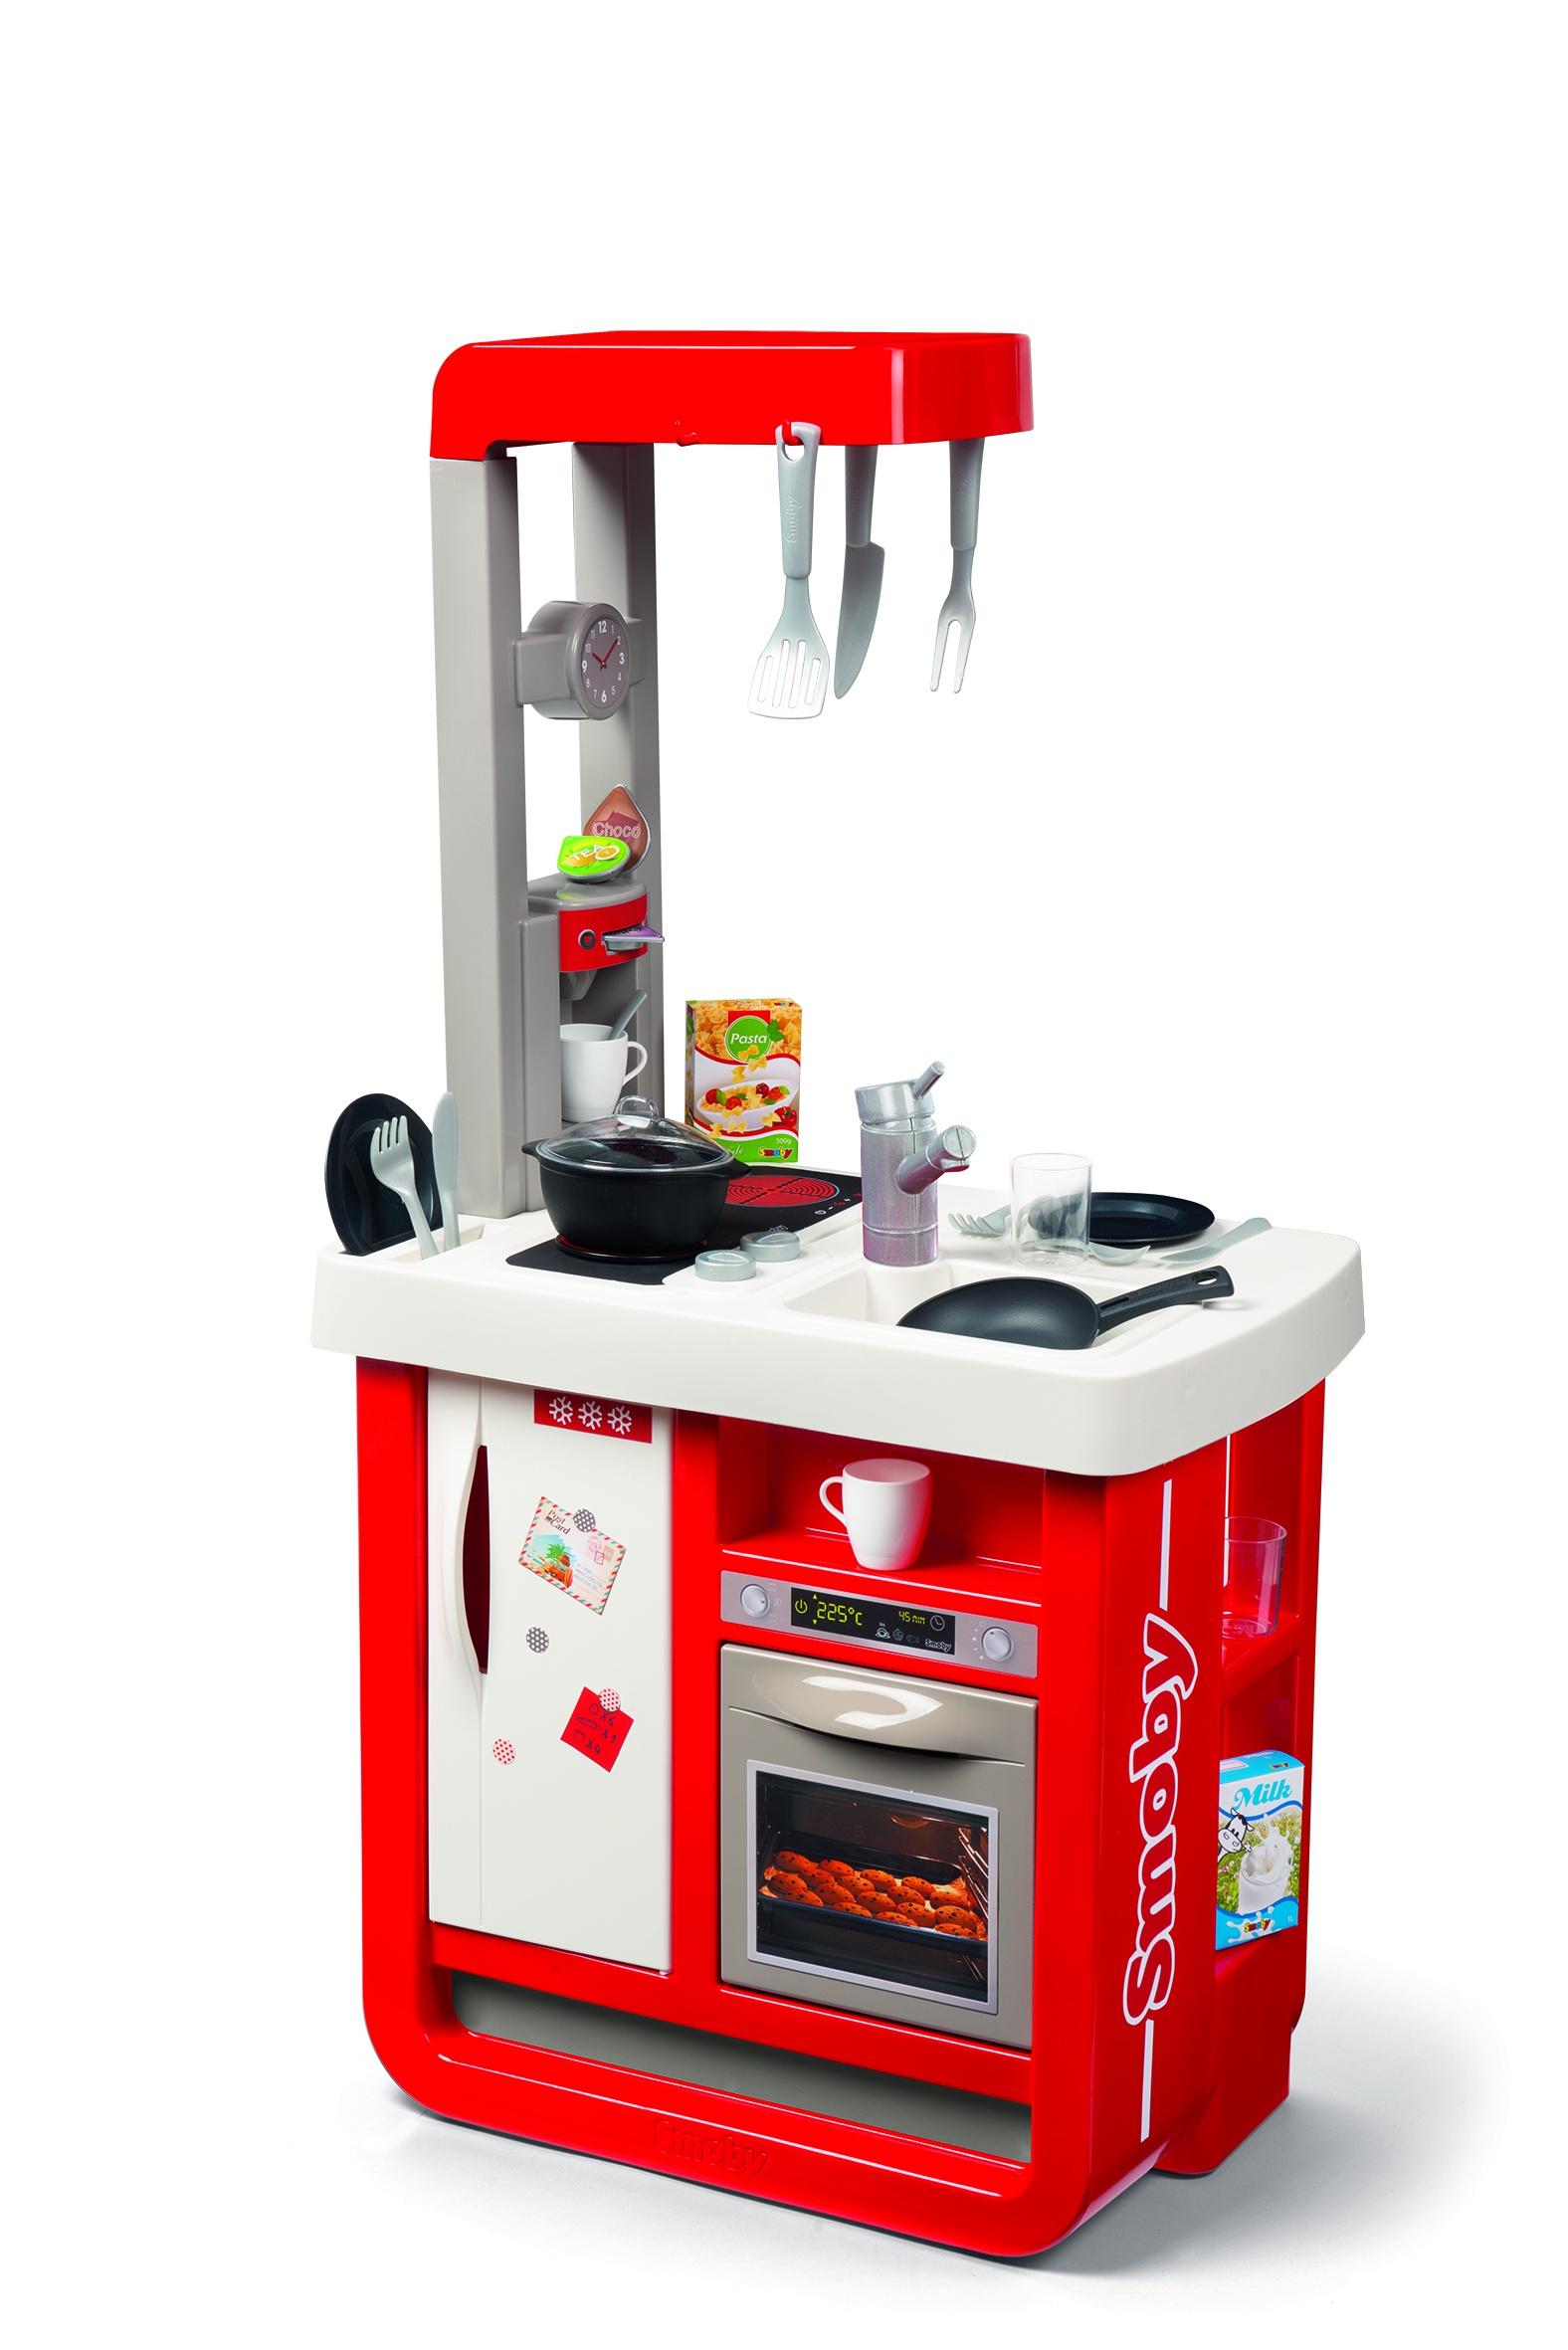 Кухня электронная Bon Appetit 52,1х32,5х95,7 см smoby кухня электронная tefal super chef deluxe звук пузырьки 46 аксессуаров 311304